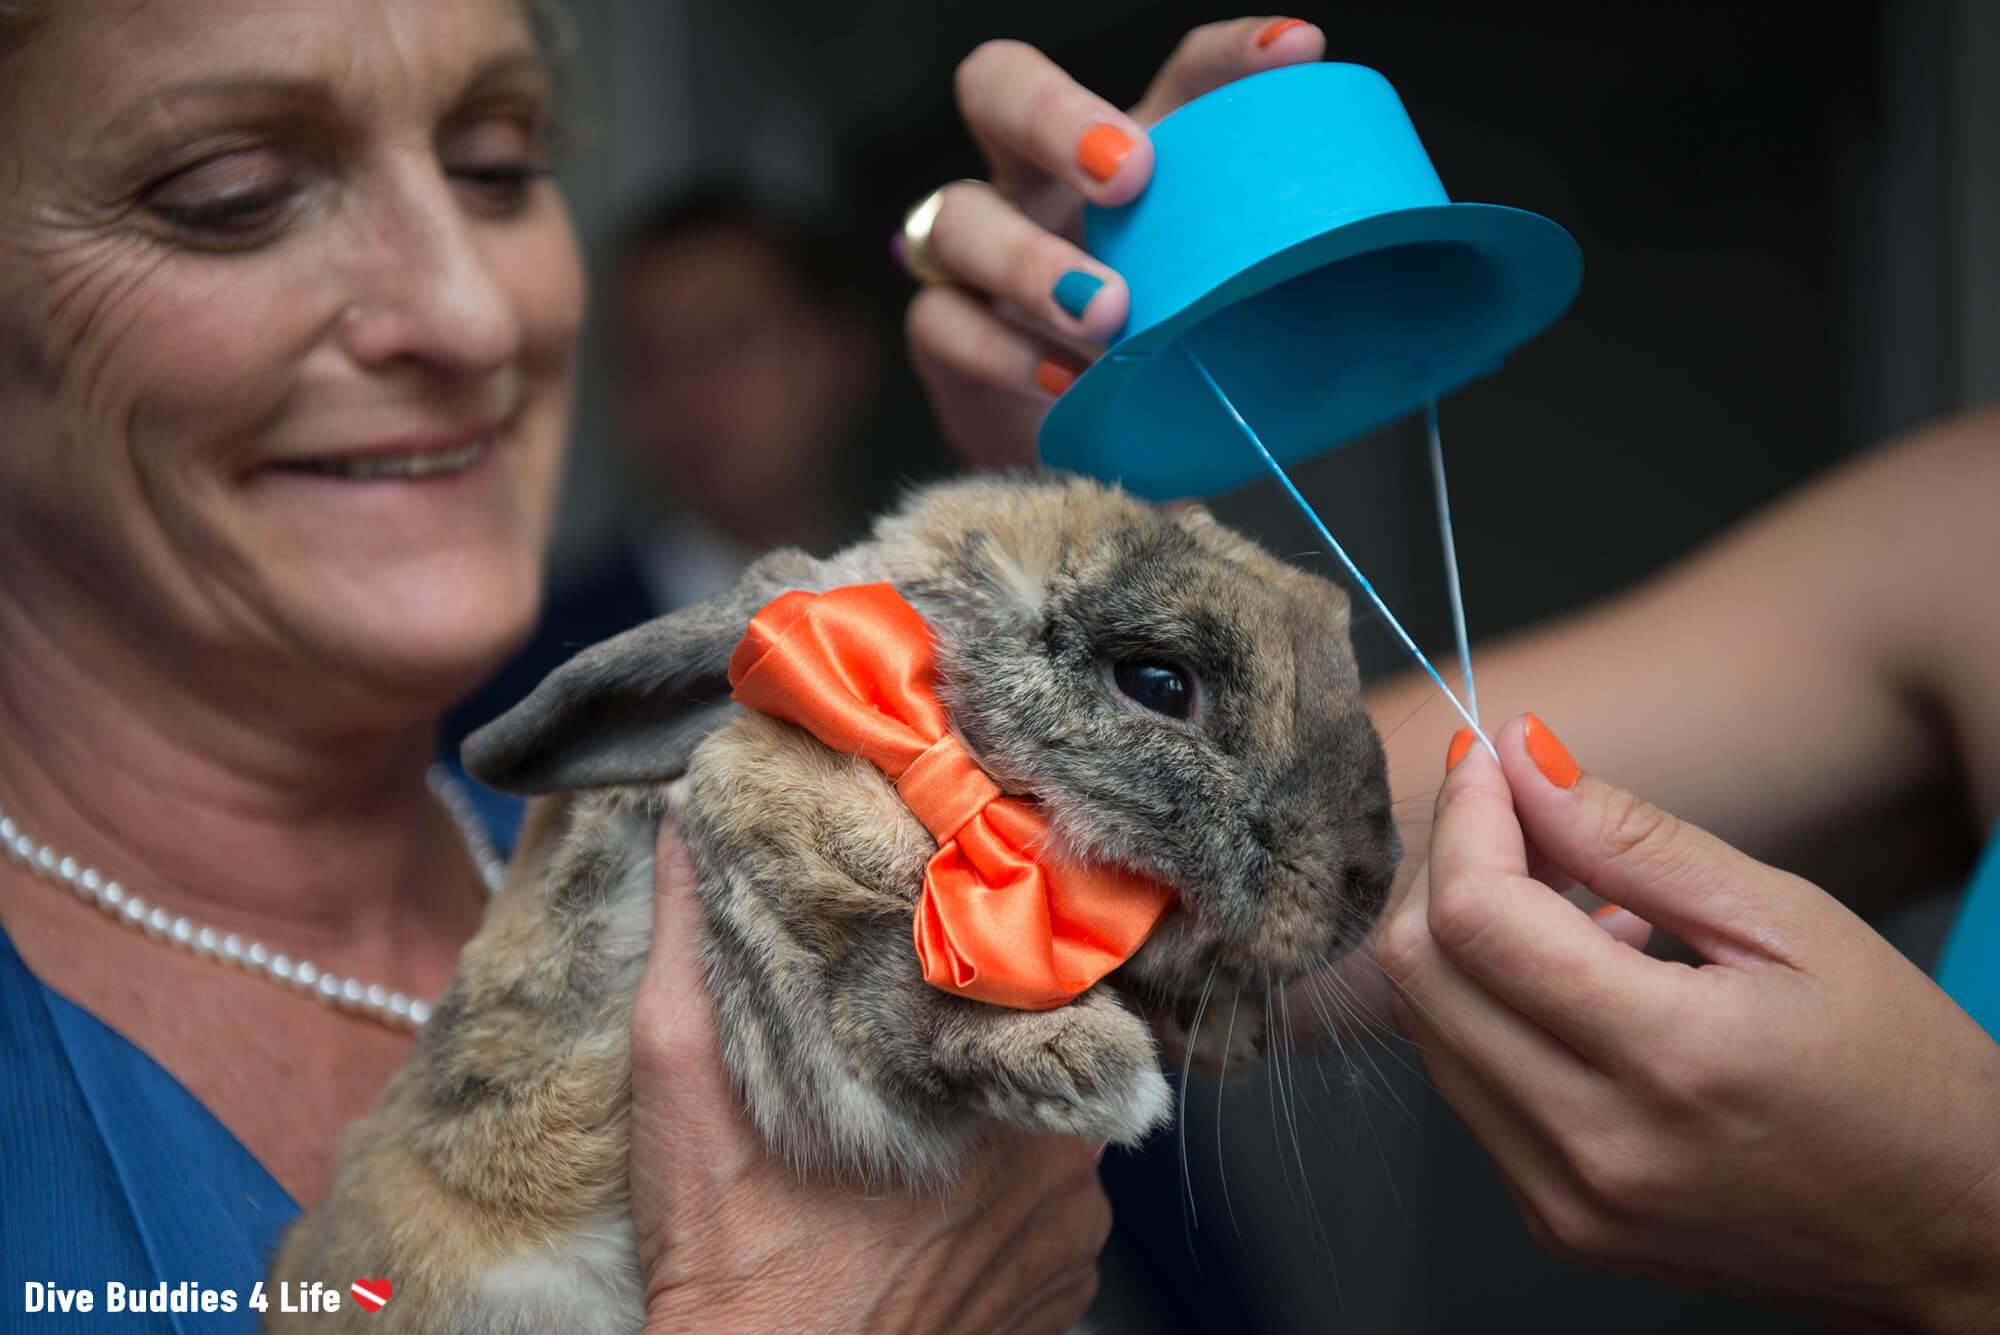 Scuba Diving Bunny Getting Ready For An Ocean Themed Wedding